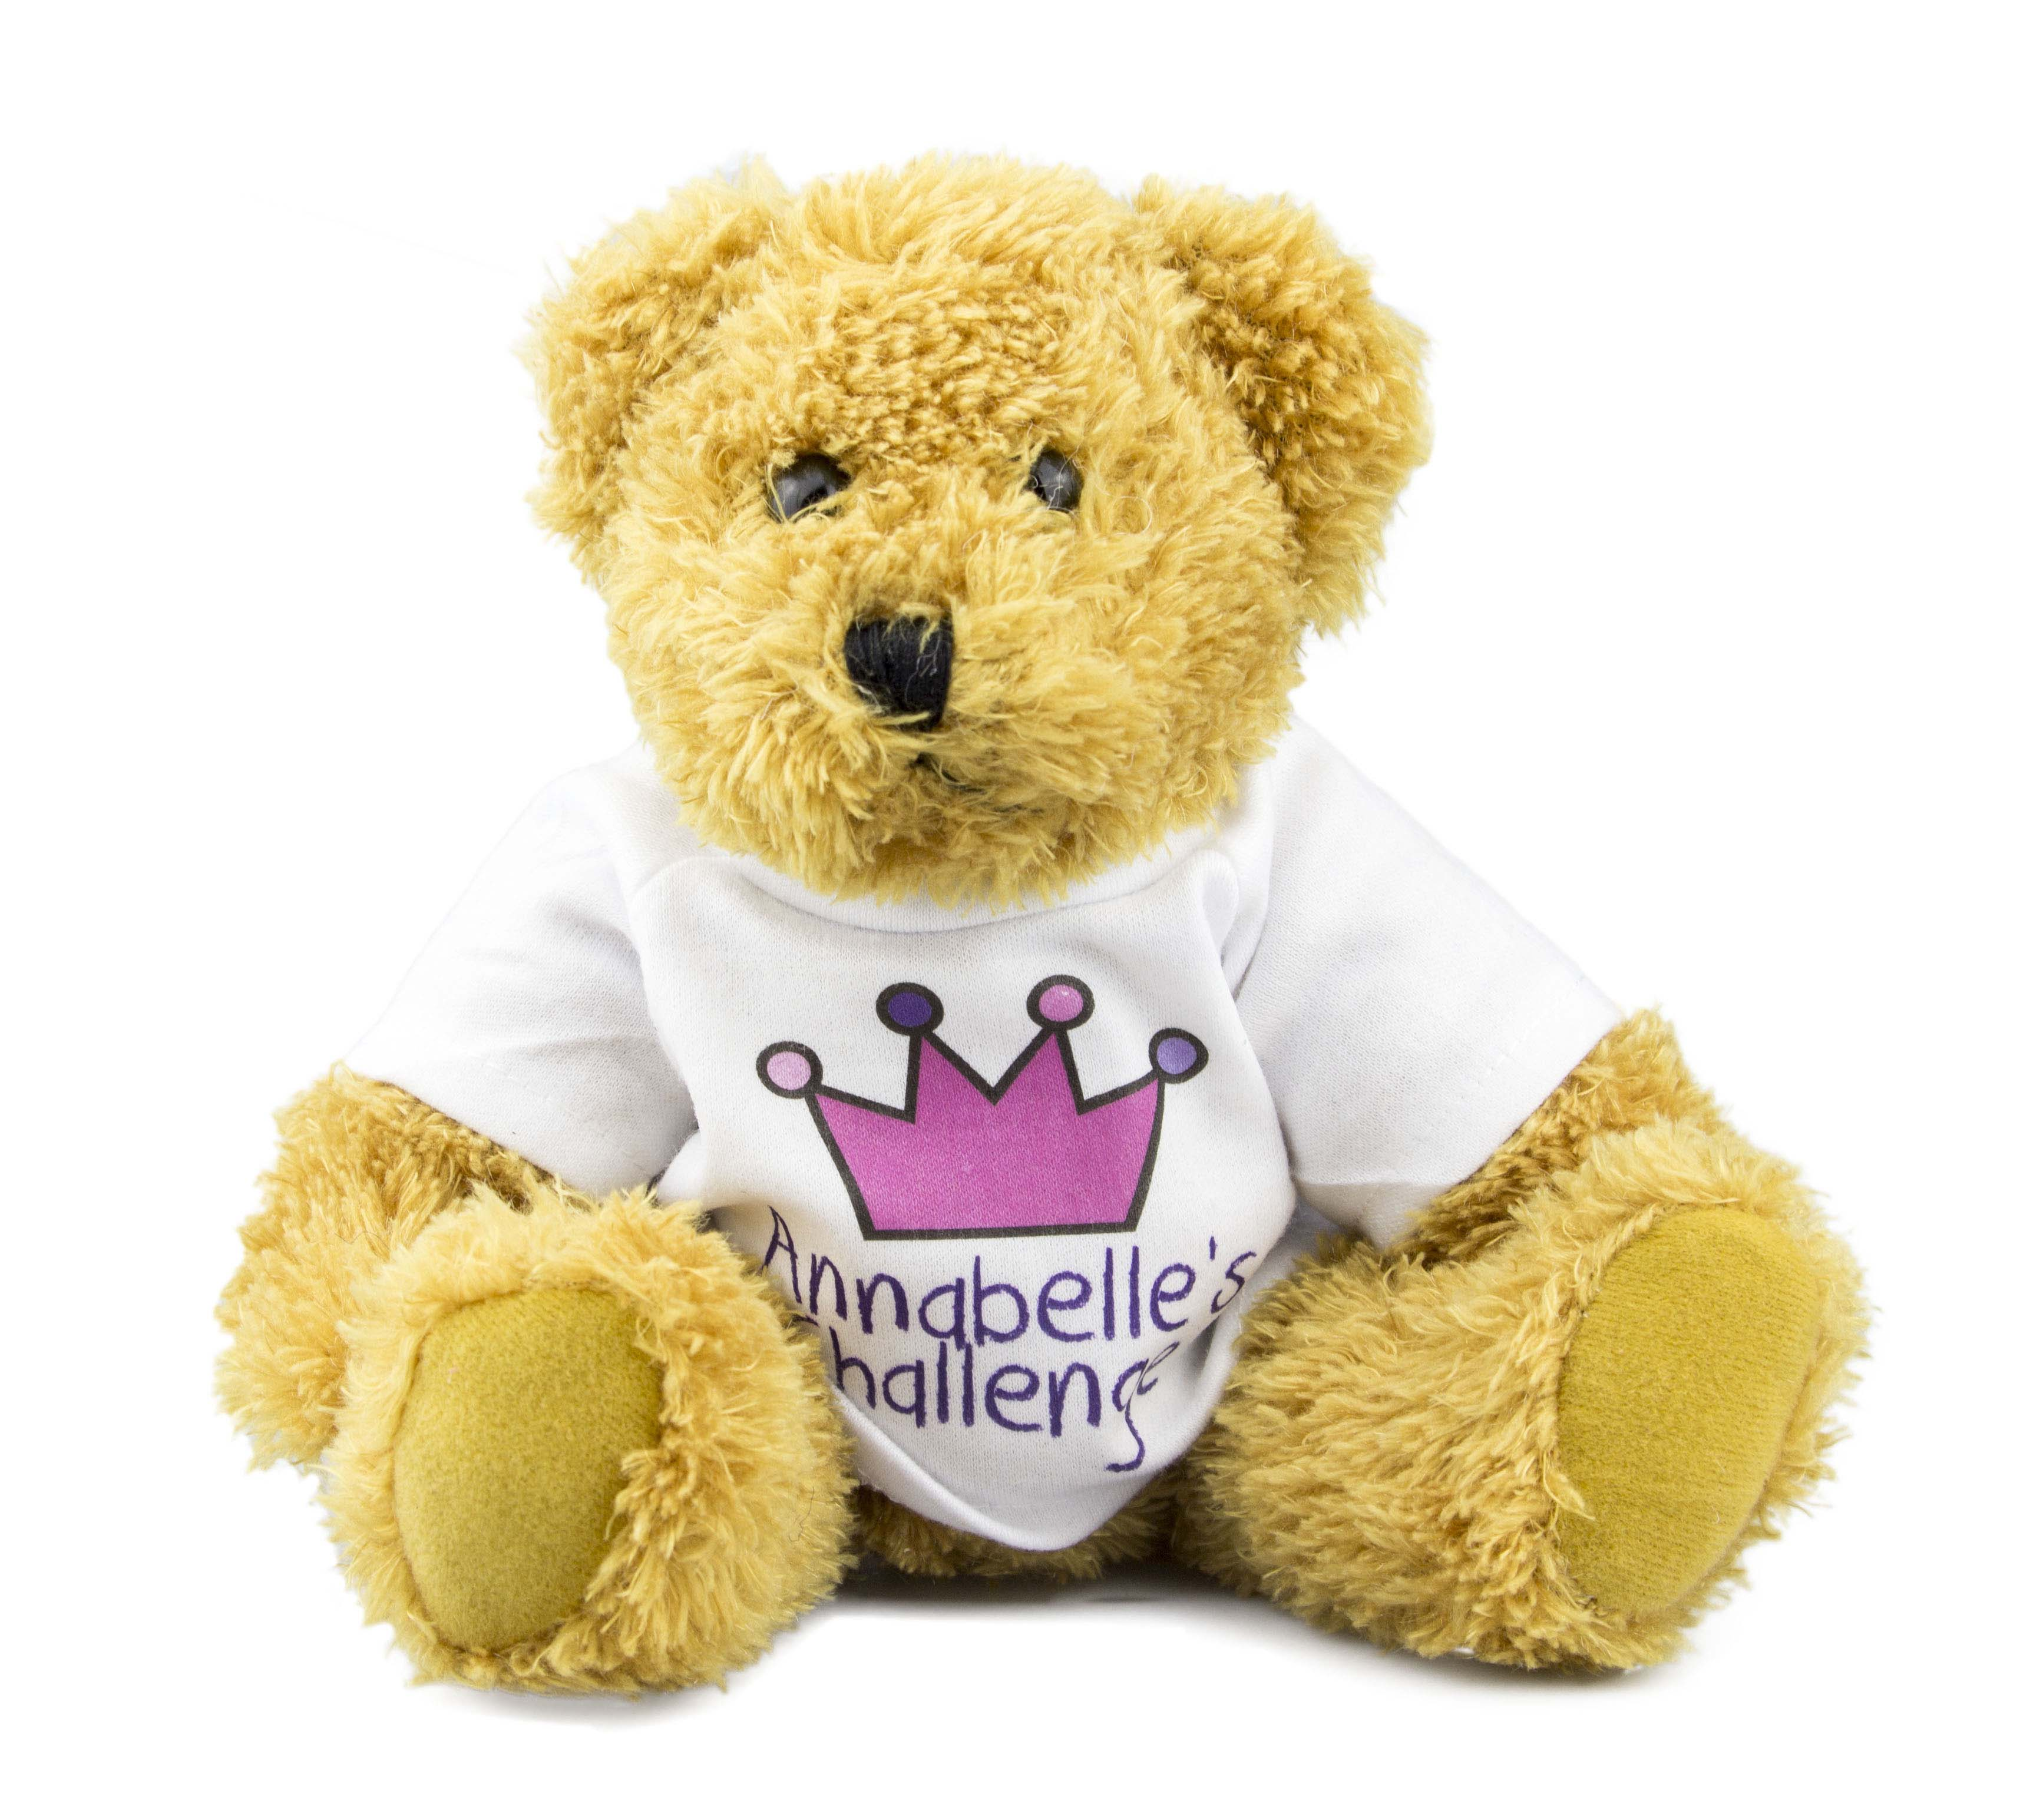 Annabelle's Challenge Mascot Toby Bear